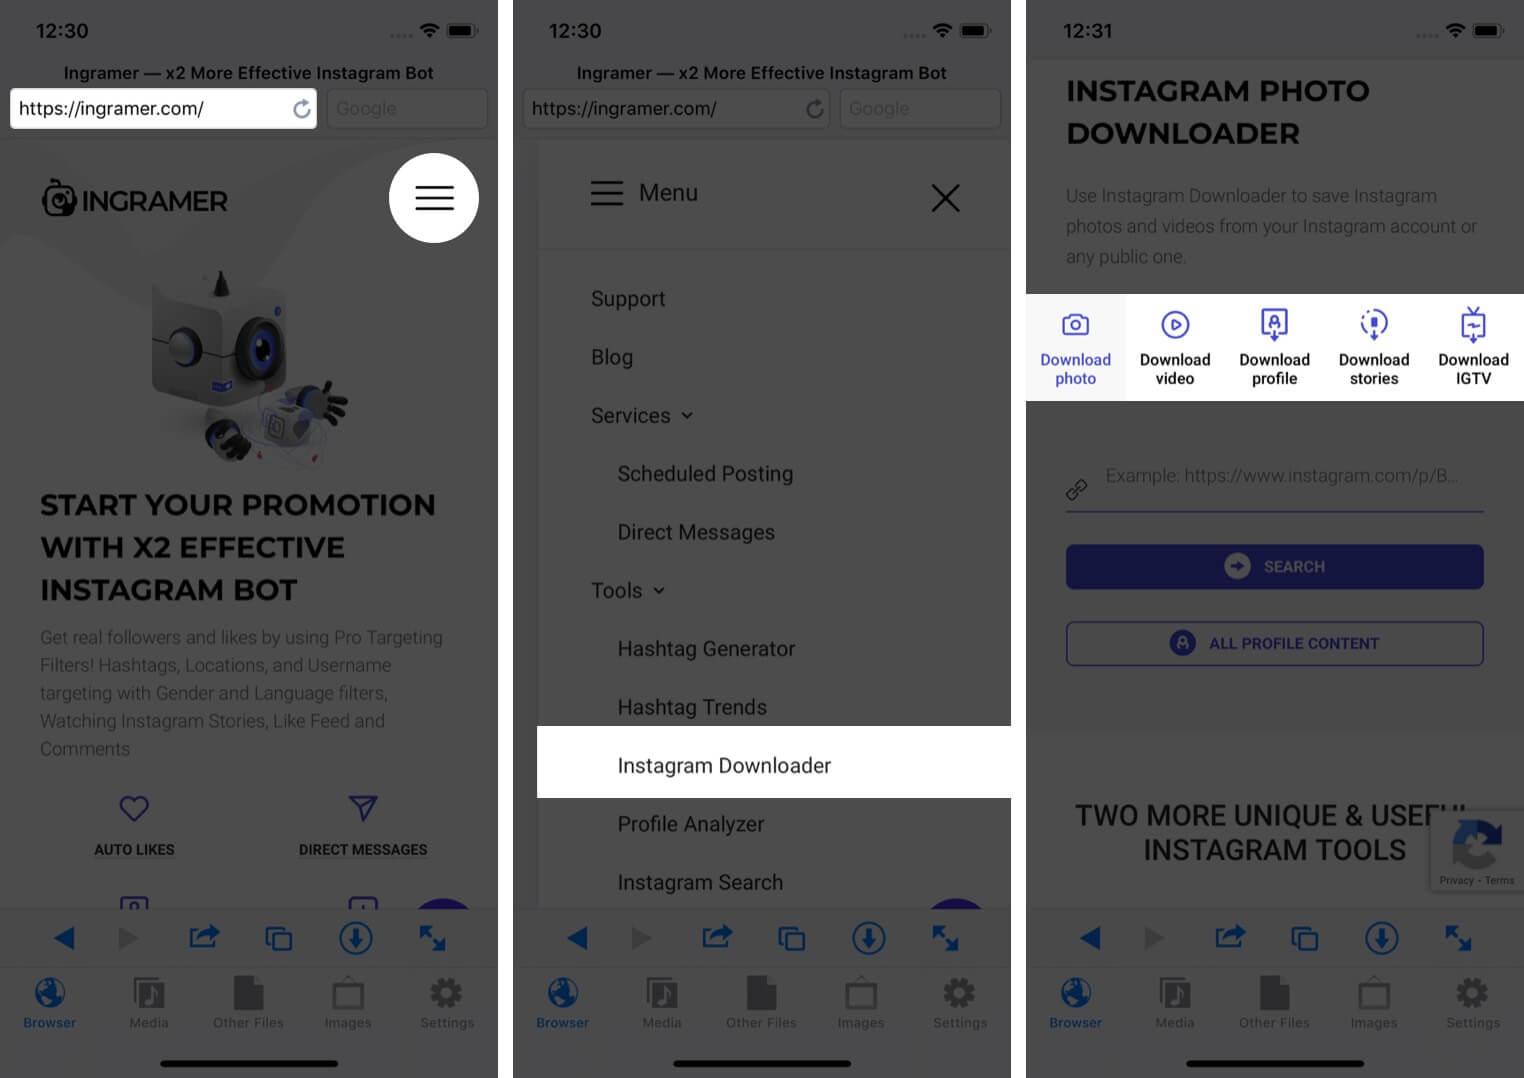 visit ingramer in safari tap on hamburger icon select instagram downloader and tap on preferred option